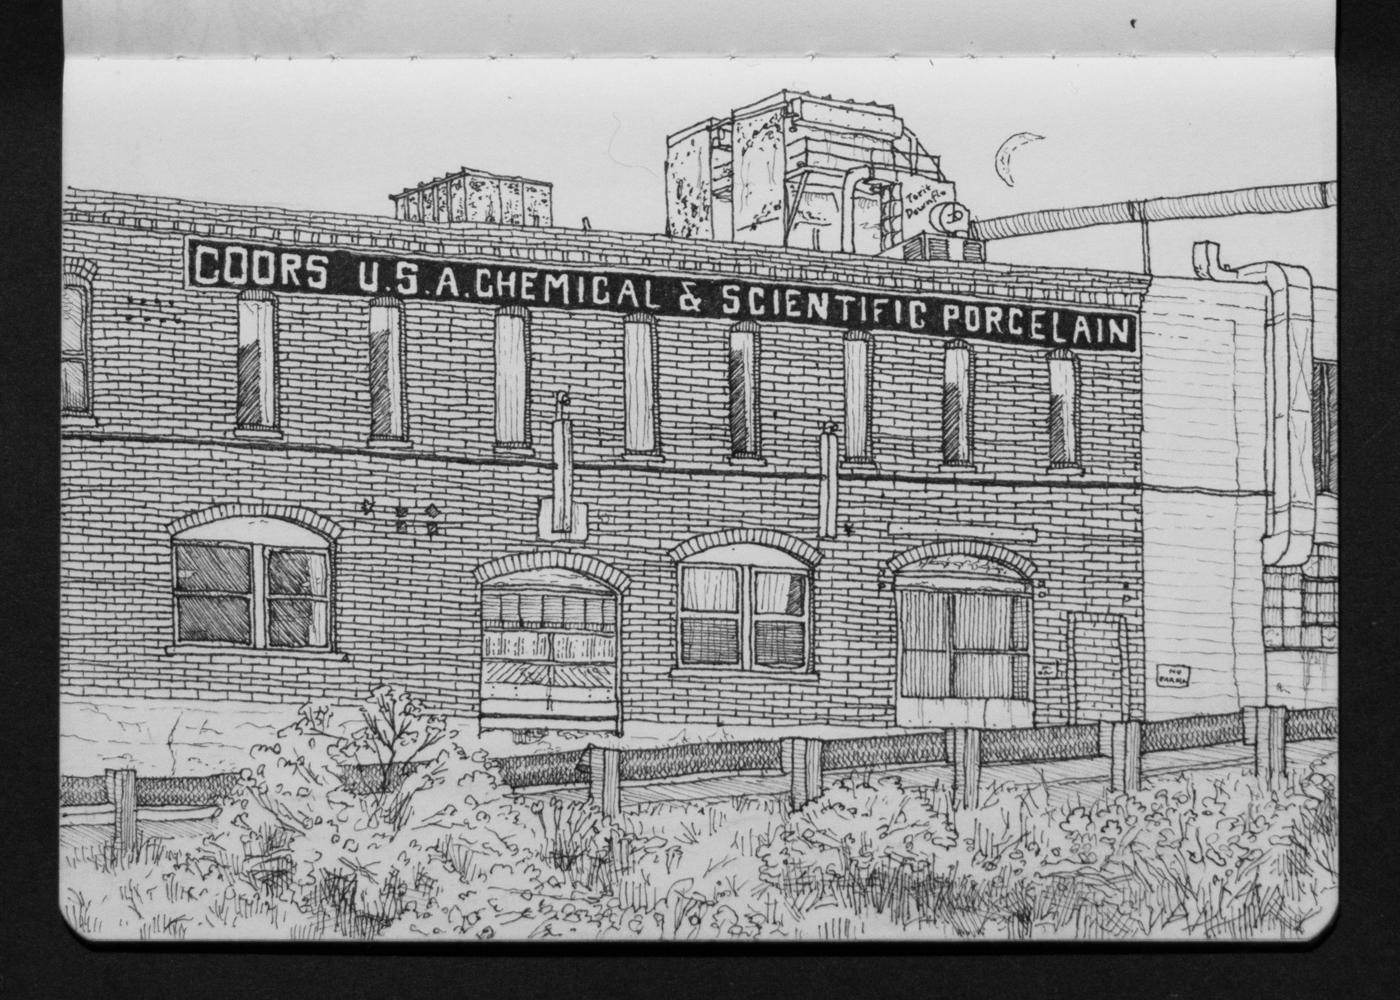 03-11 Coors Porcelain Factory.jpg